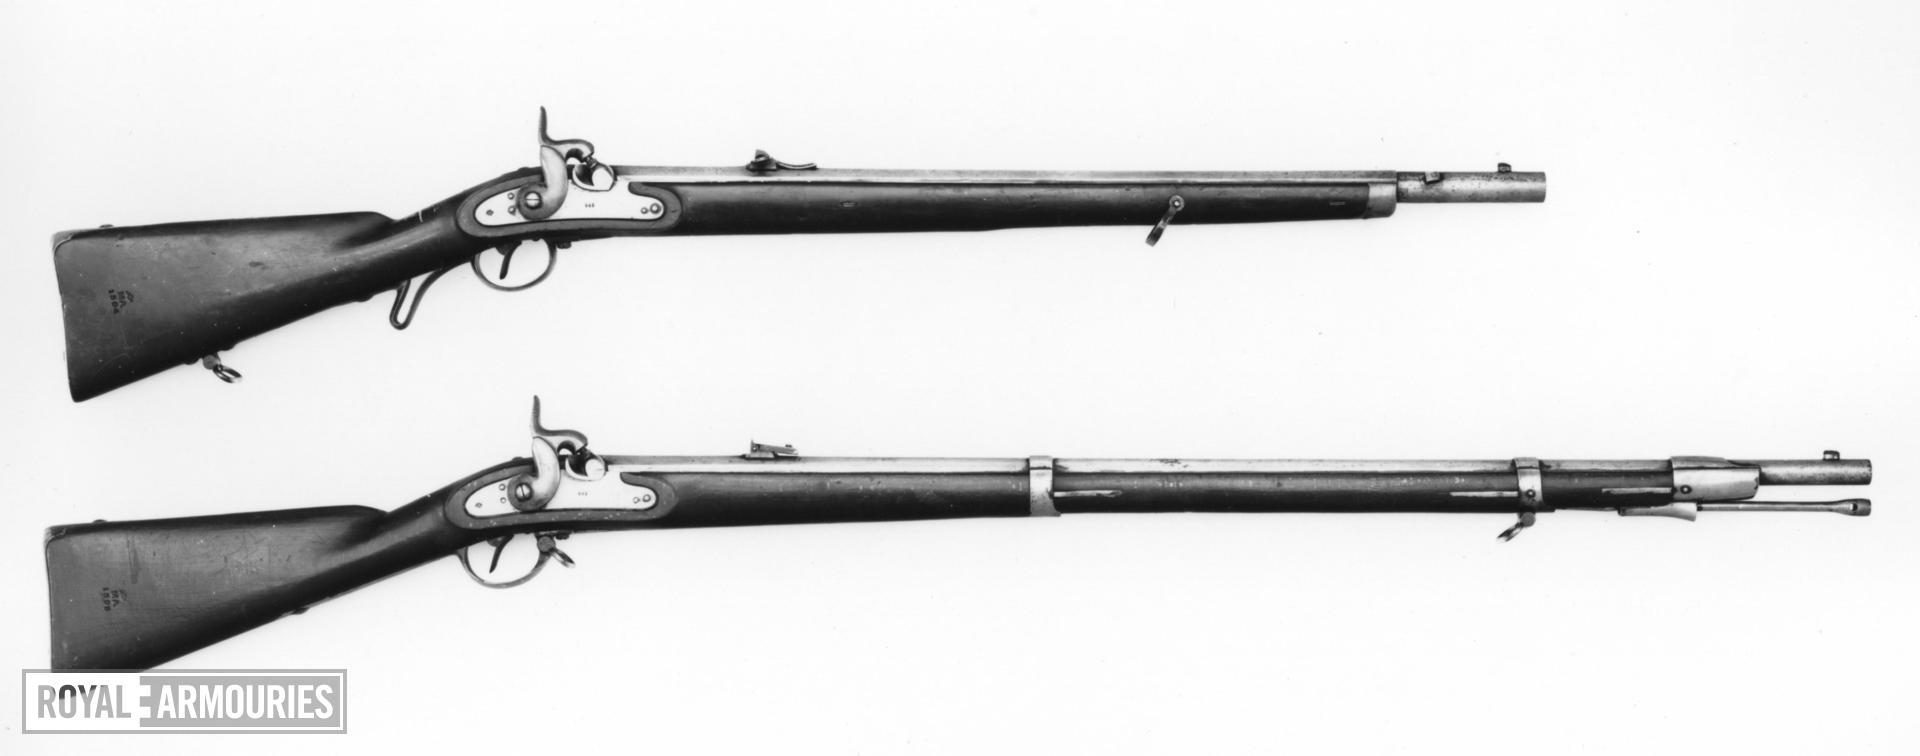 Percussion muzzle-loading rifle - Model 1854